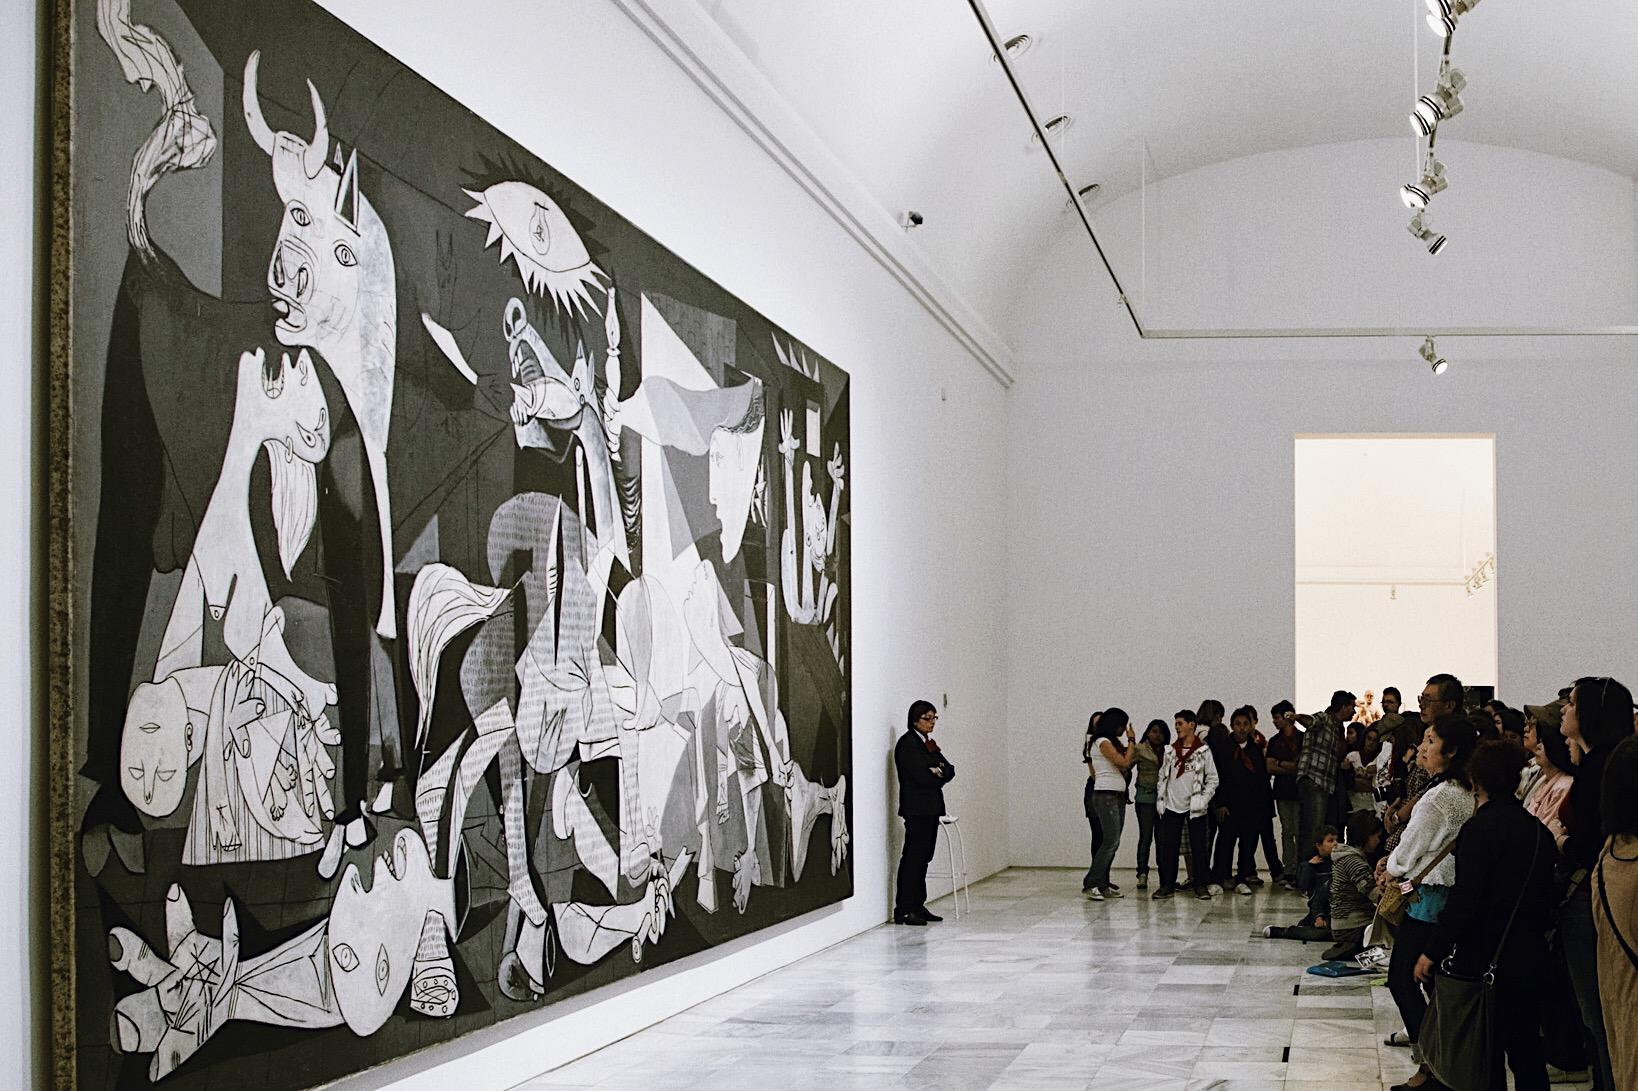 The Reina Sofia Museum Skip-the-Line Guided Tour – Private